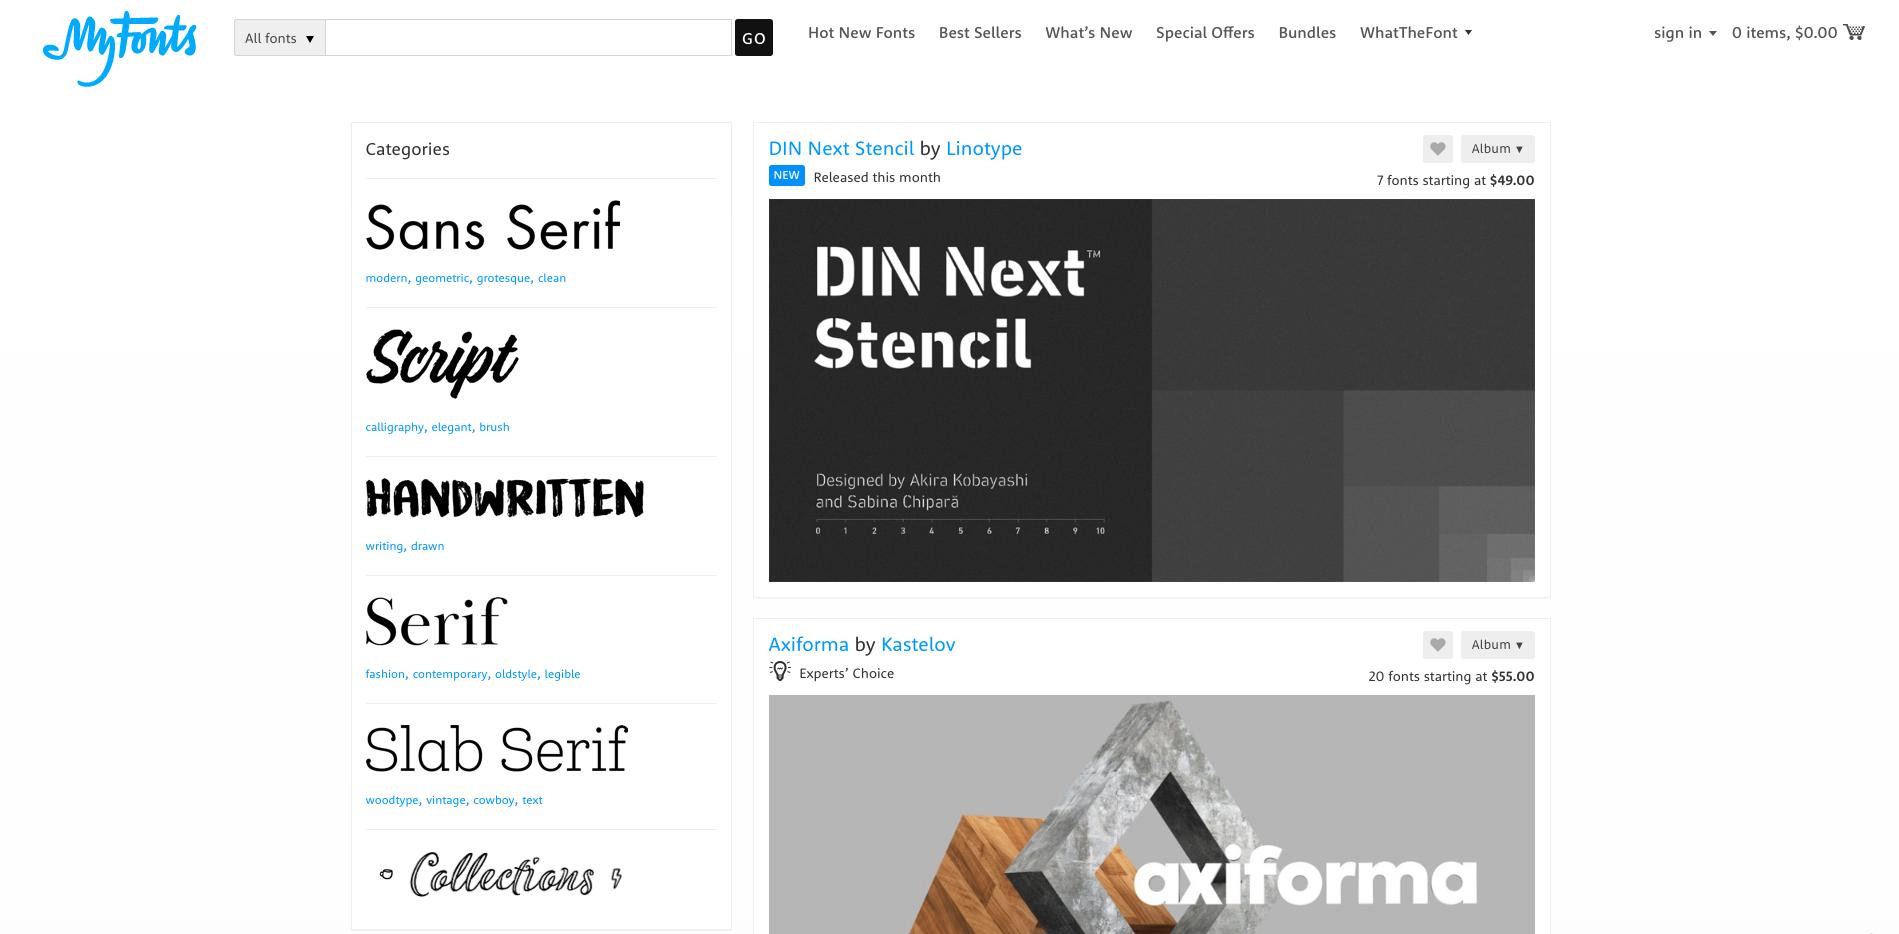 Top 200 Graphic App Web Design Tools | Workfront